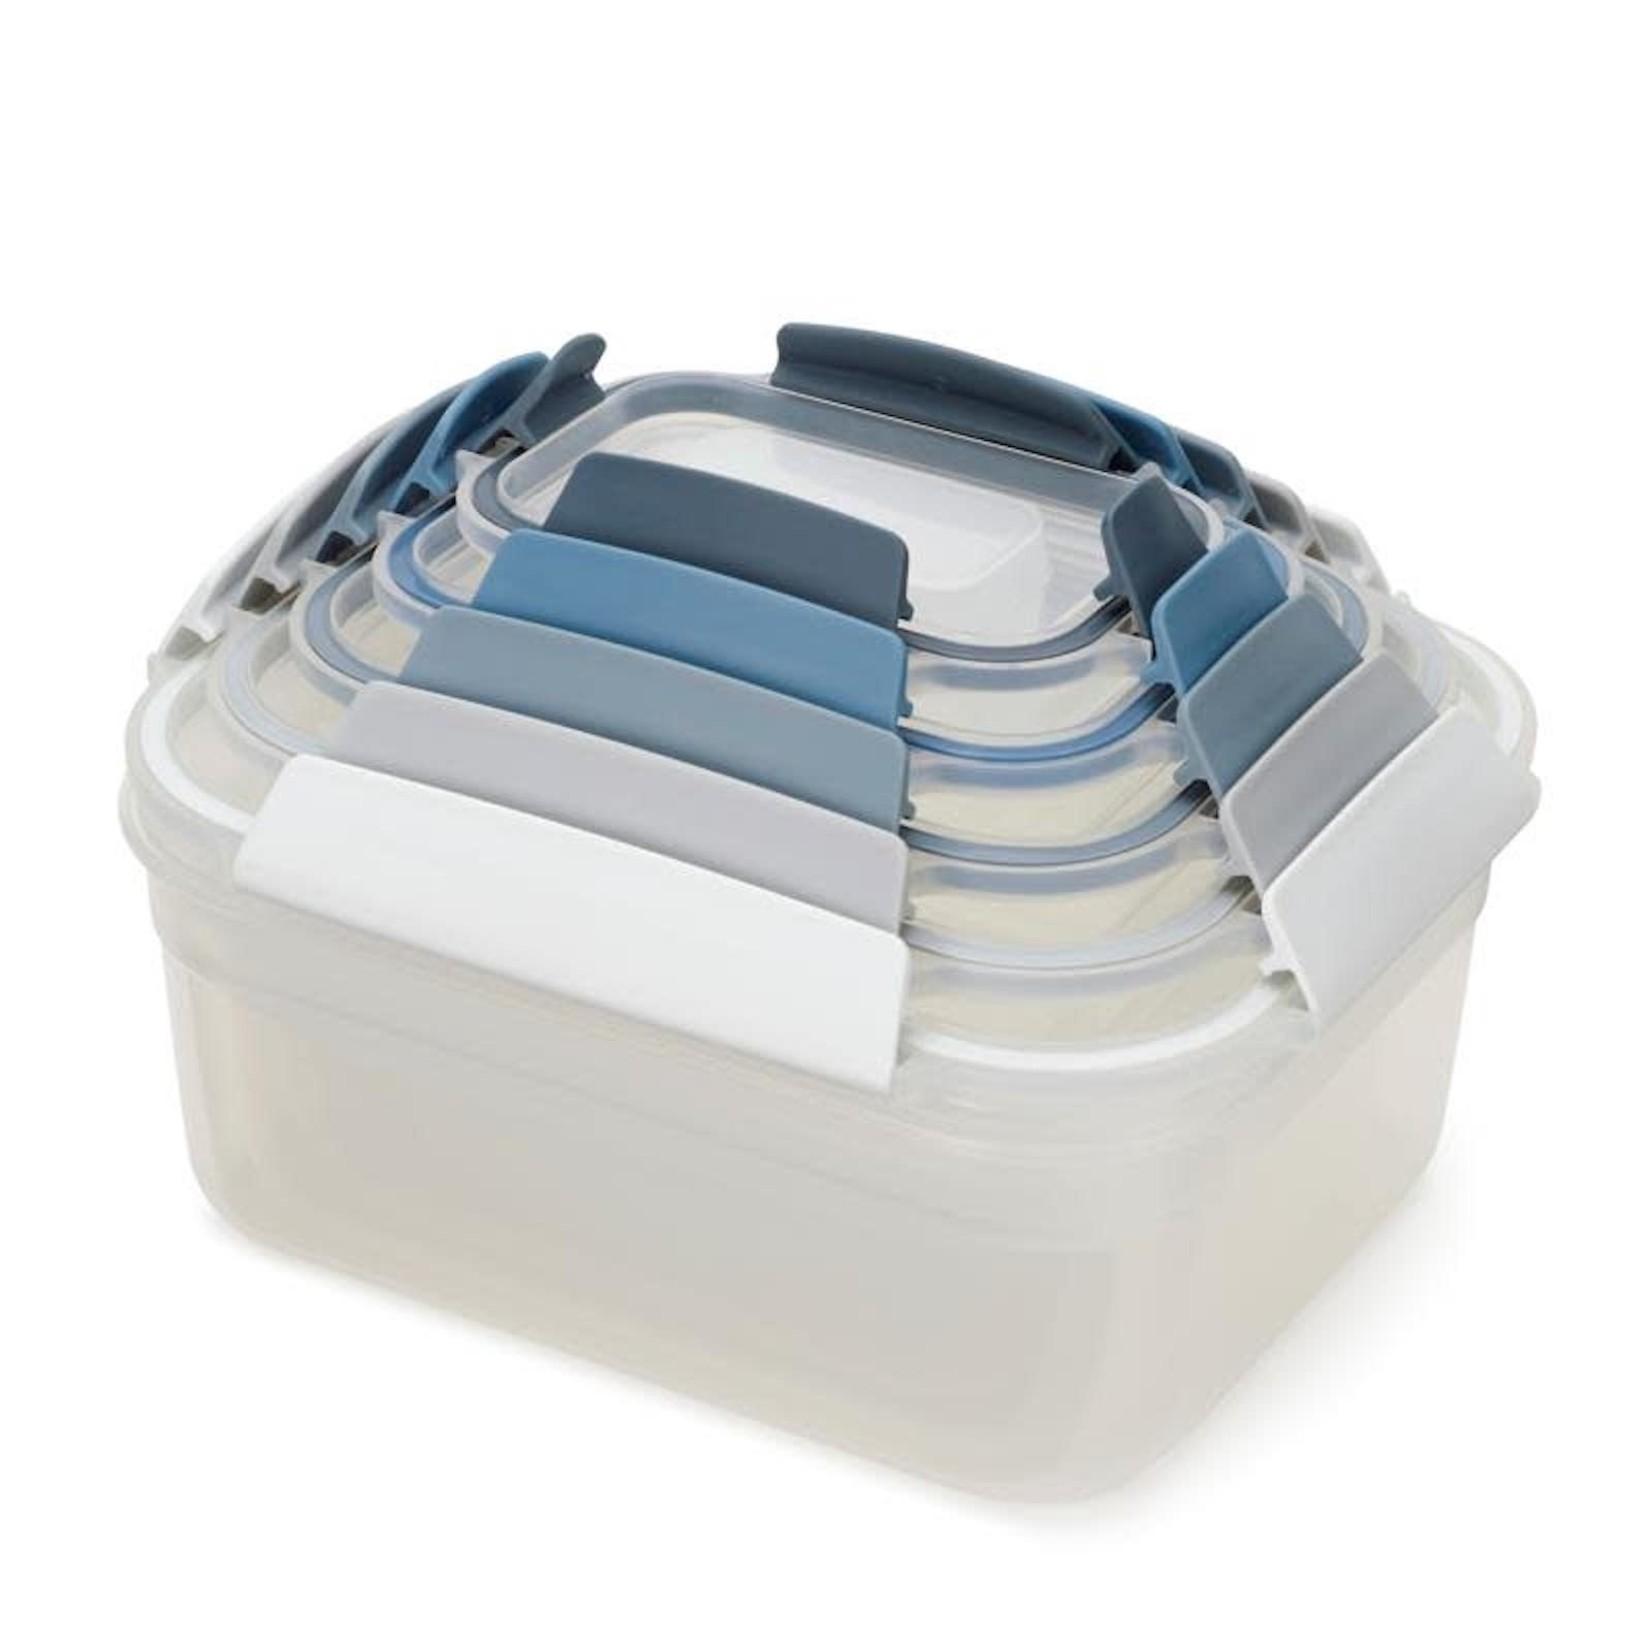 Joseph Joseph Nest Lock Storage Container (Multiple Options)